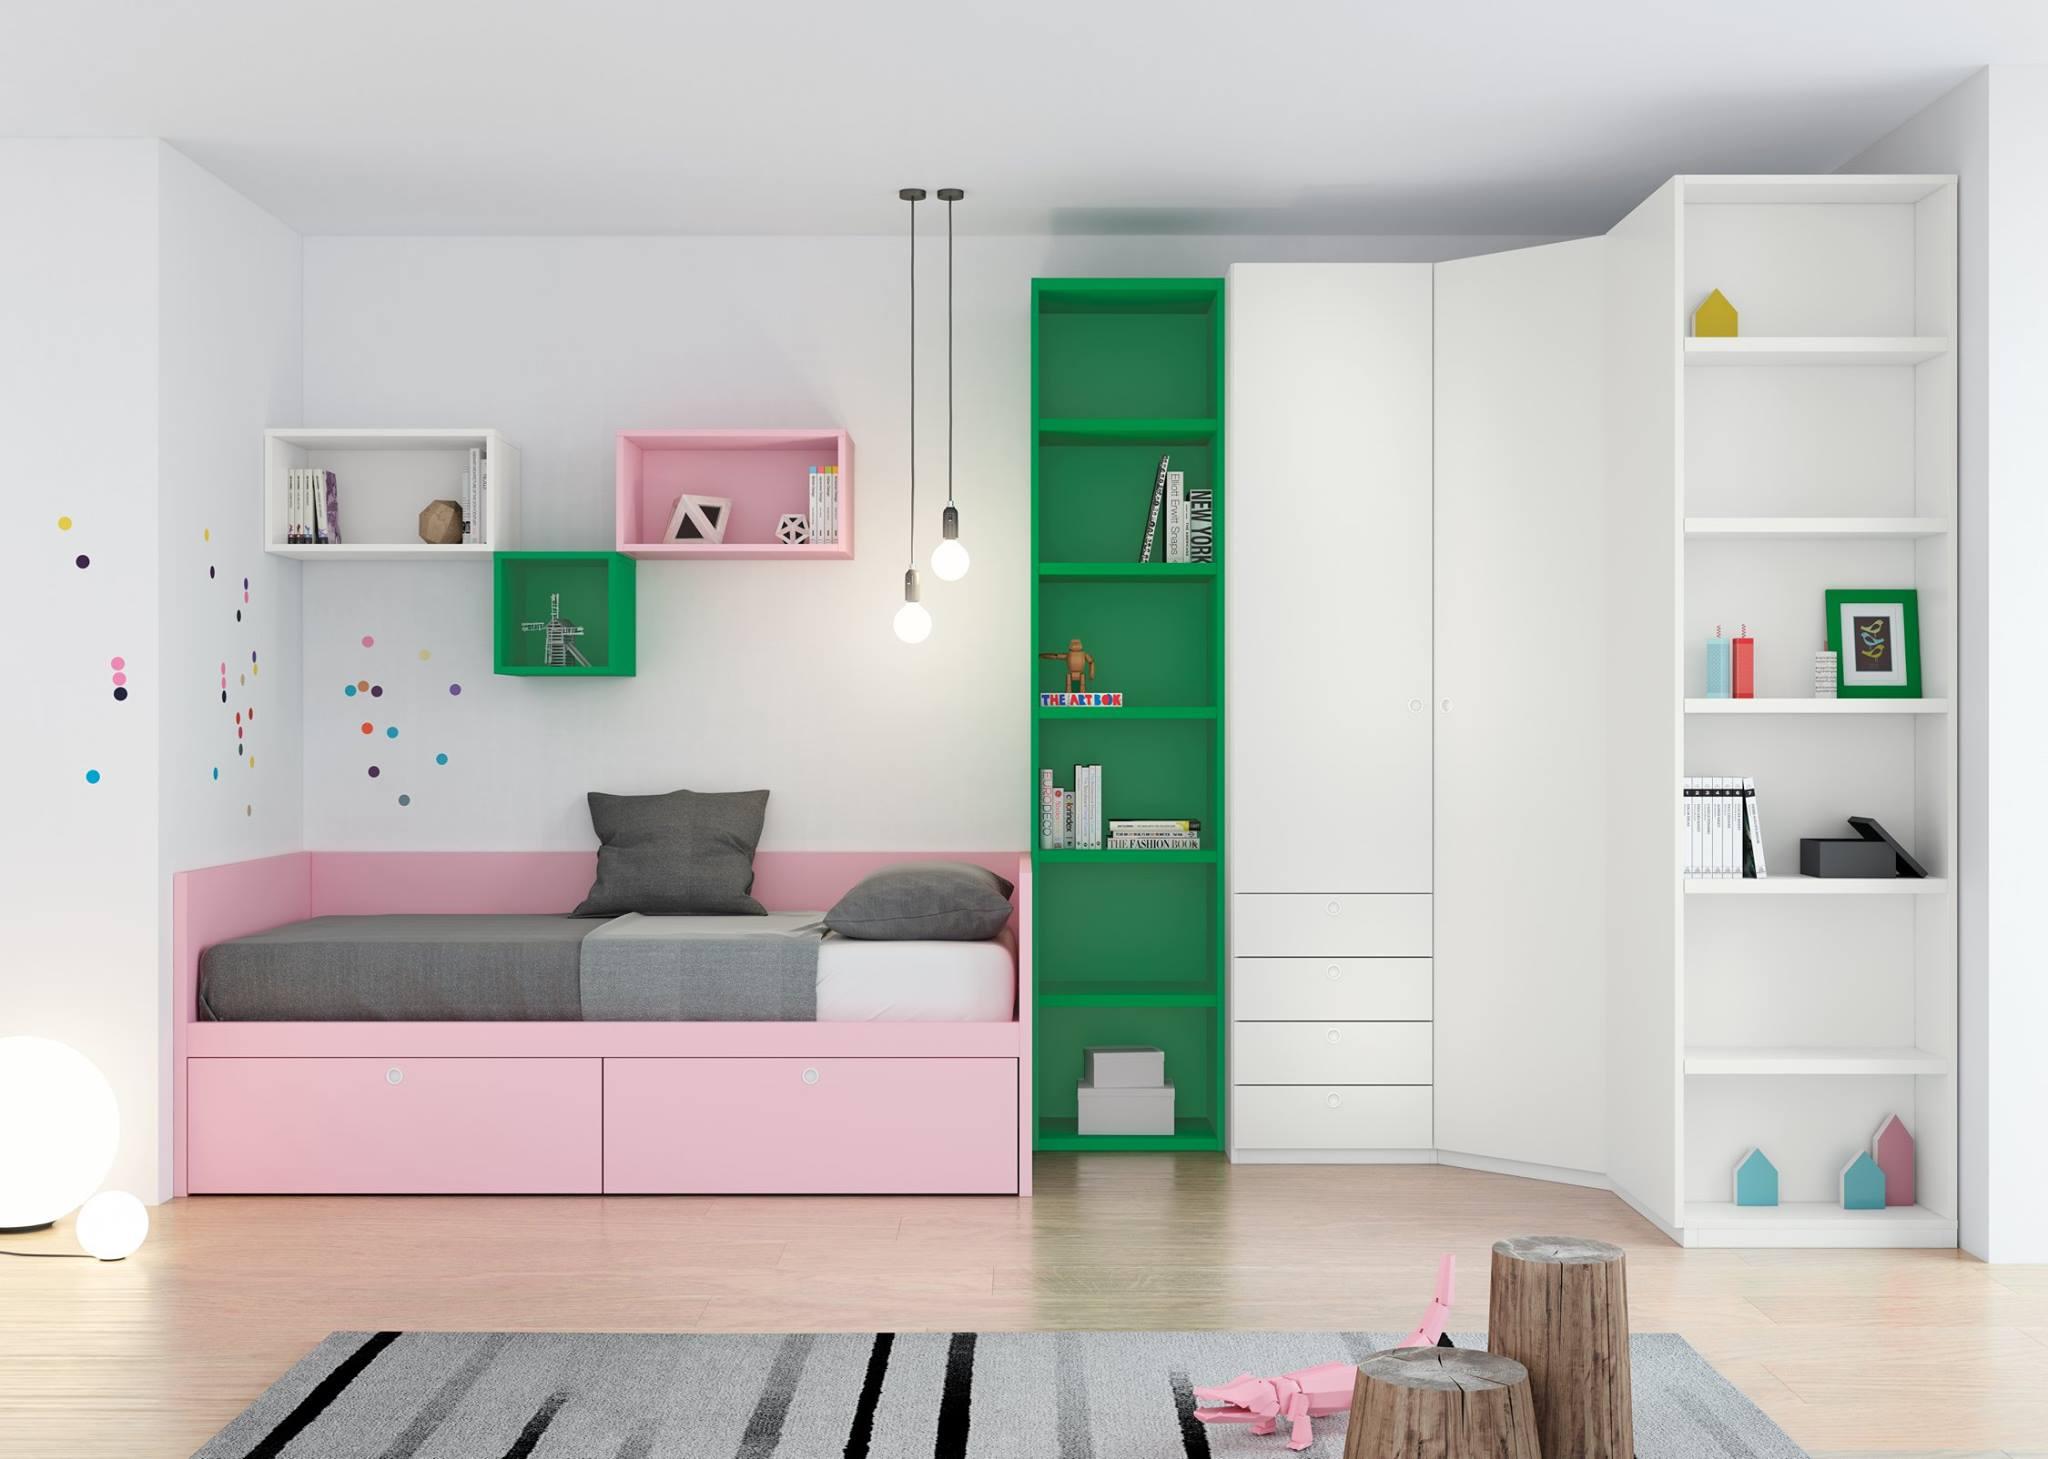 Muebles bidasoa en irun vende muebles de sal n cl sicos - Dormitorio clasico moderno ...